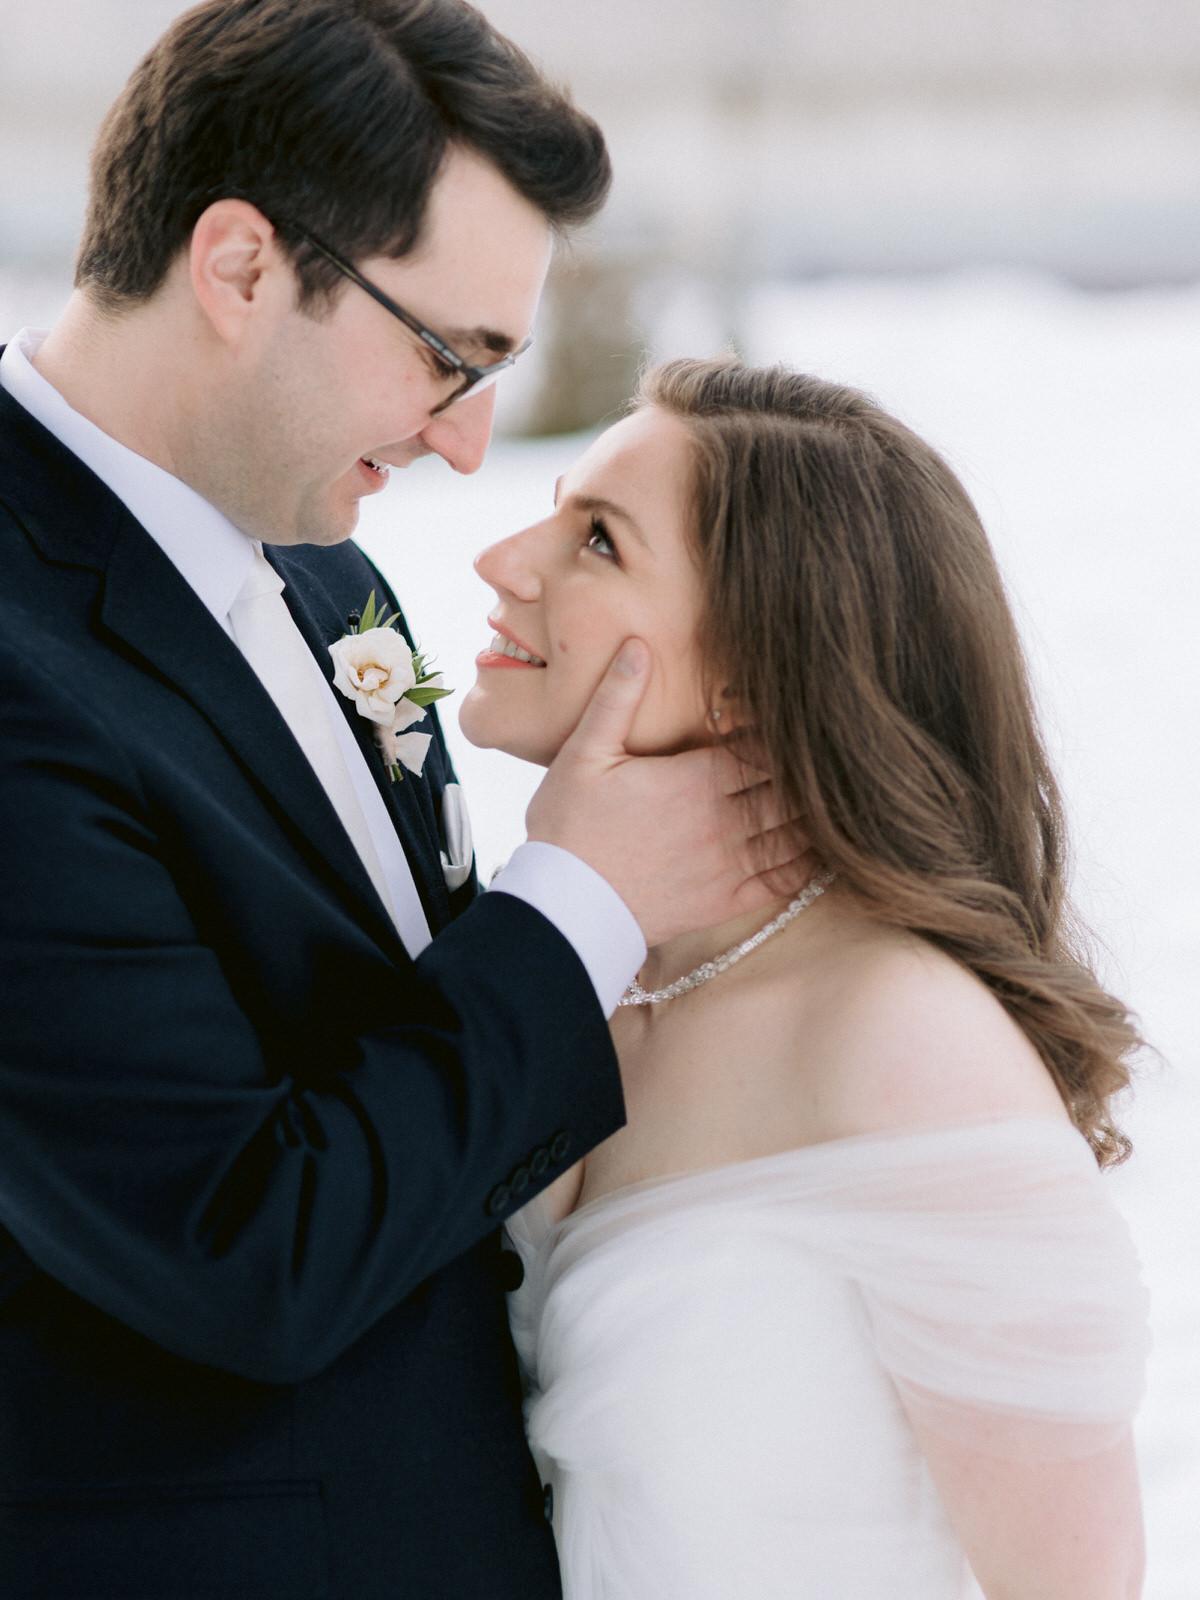 Wedding Waldhaus Flims, Photographer Switzerland, Youri Claessens Photography